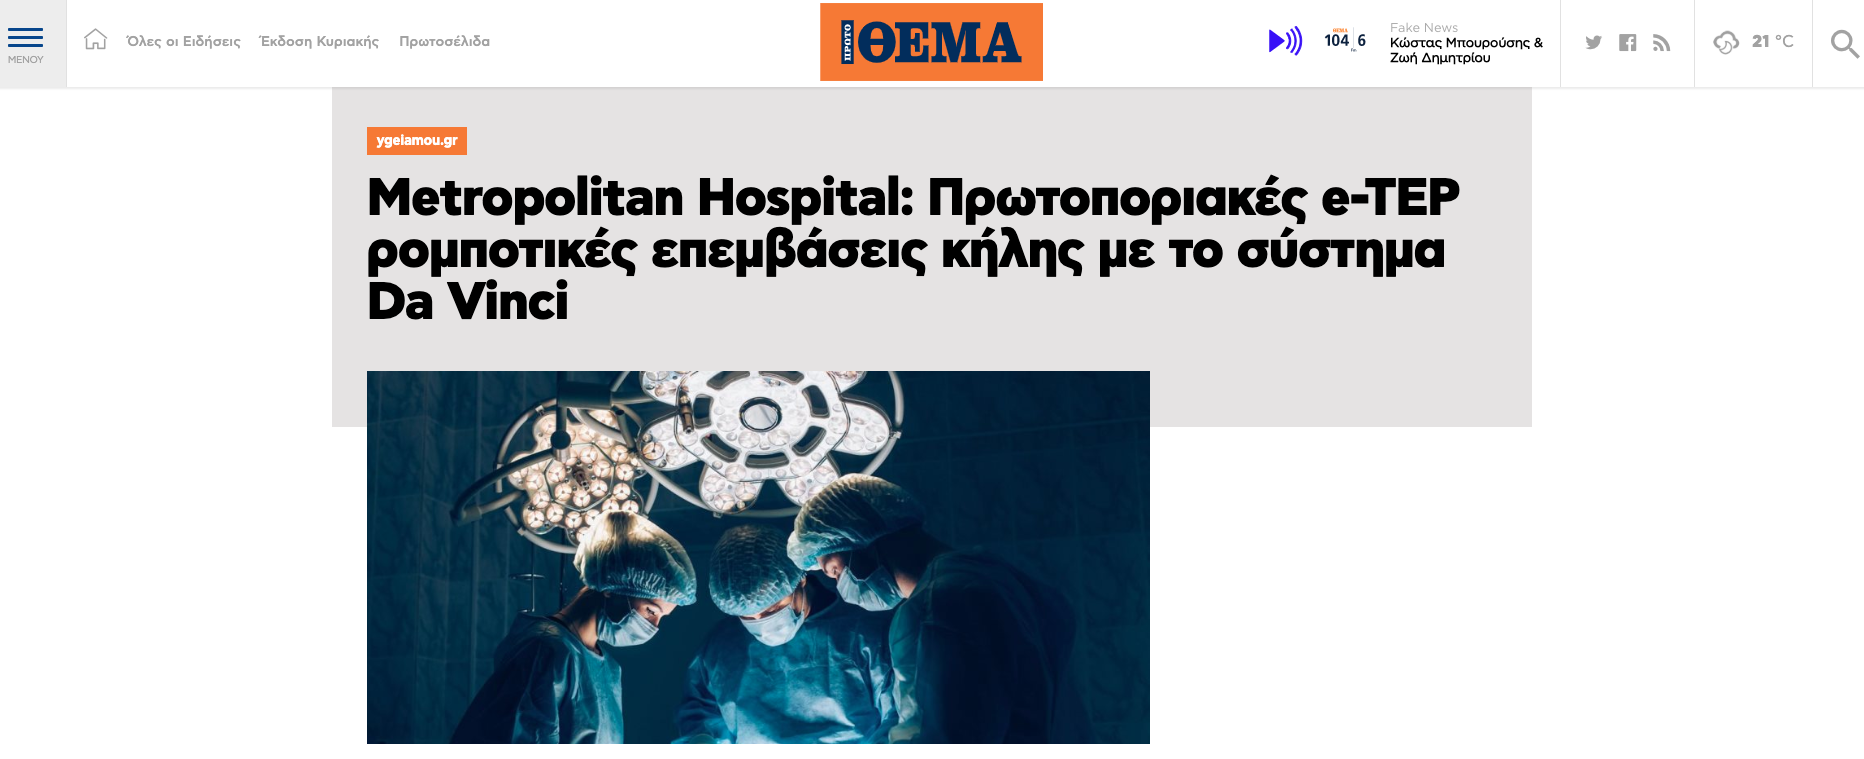 Metropolitan Hospital: Πρωτοποριακές e-TEP ρομποτικές επεμβάσεις κήλης με το σύστημα Da Vinci